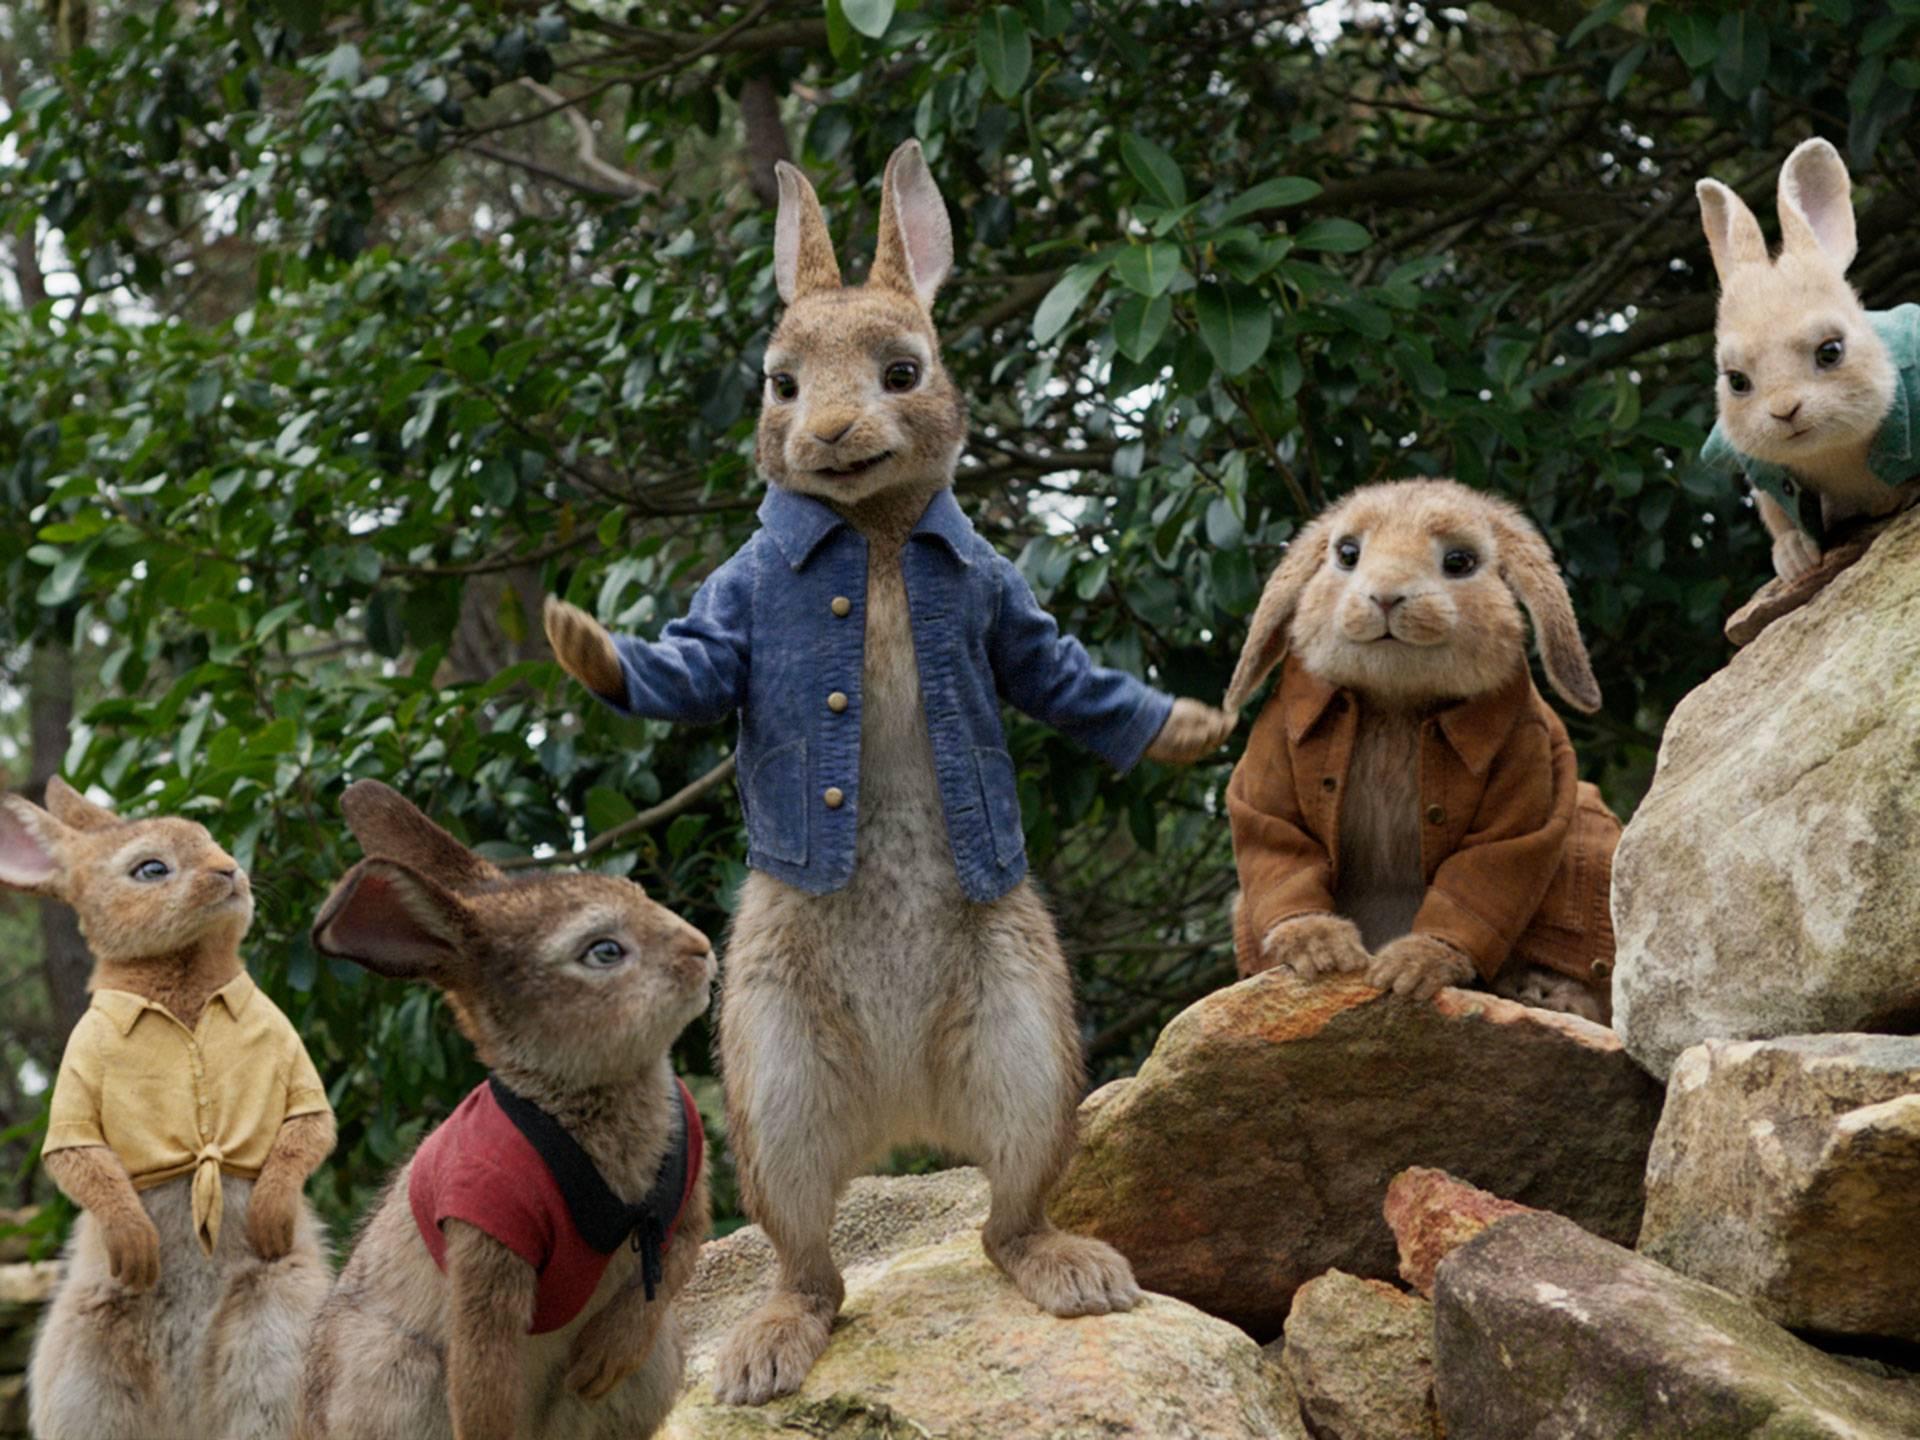 mgid:file:gsp:scenic:/international/nick-intl/images/series/orange-carpet/ep-24-peter-rabbit/peter-rabbit-02.jpg